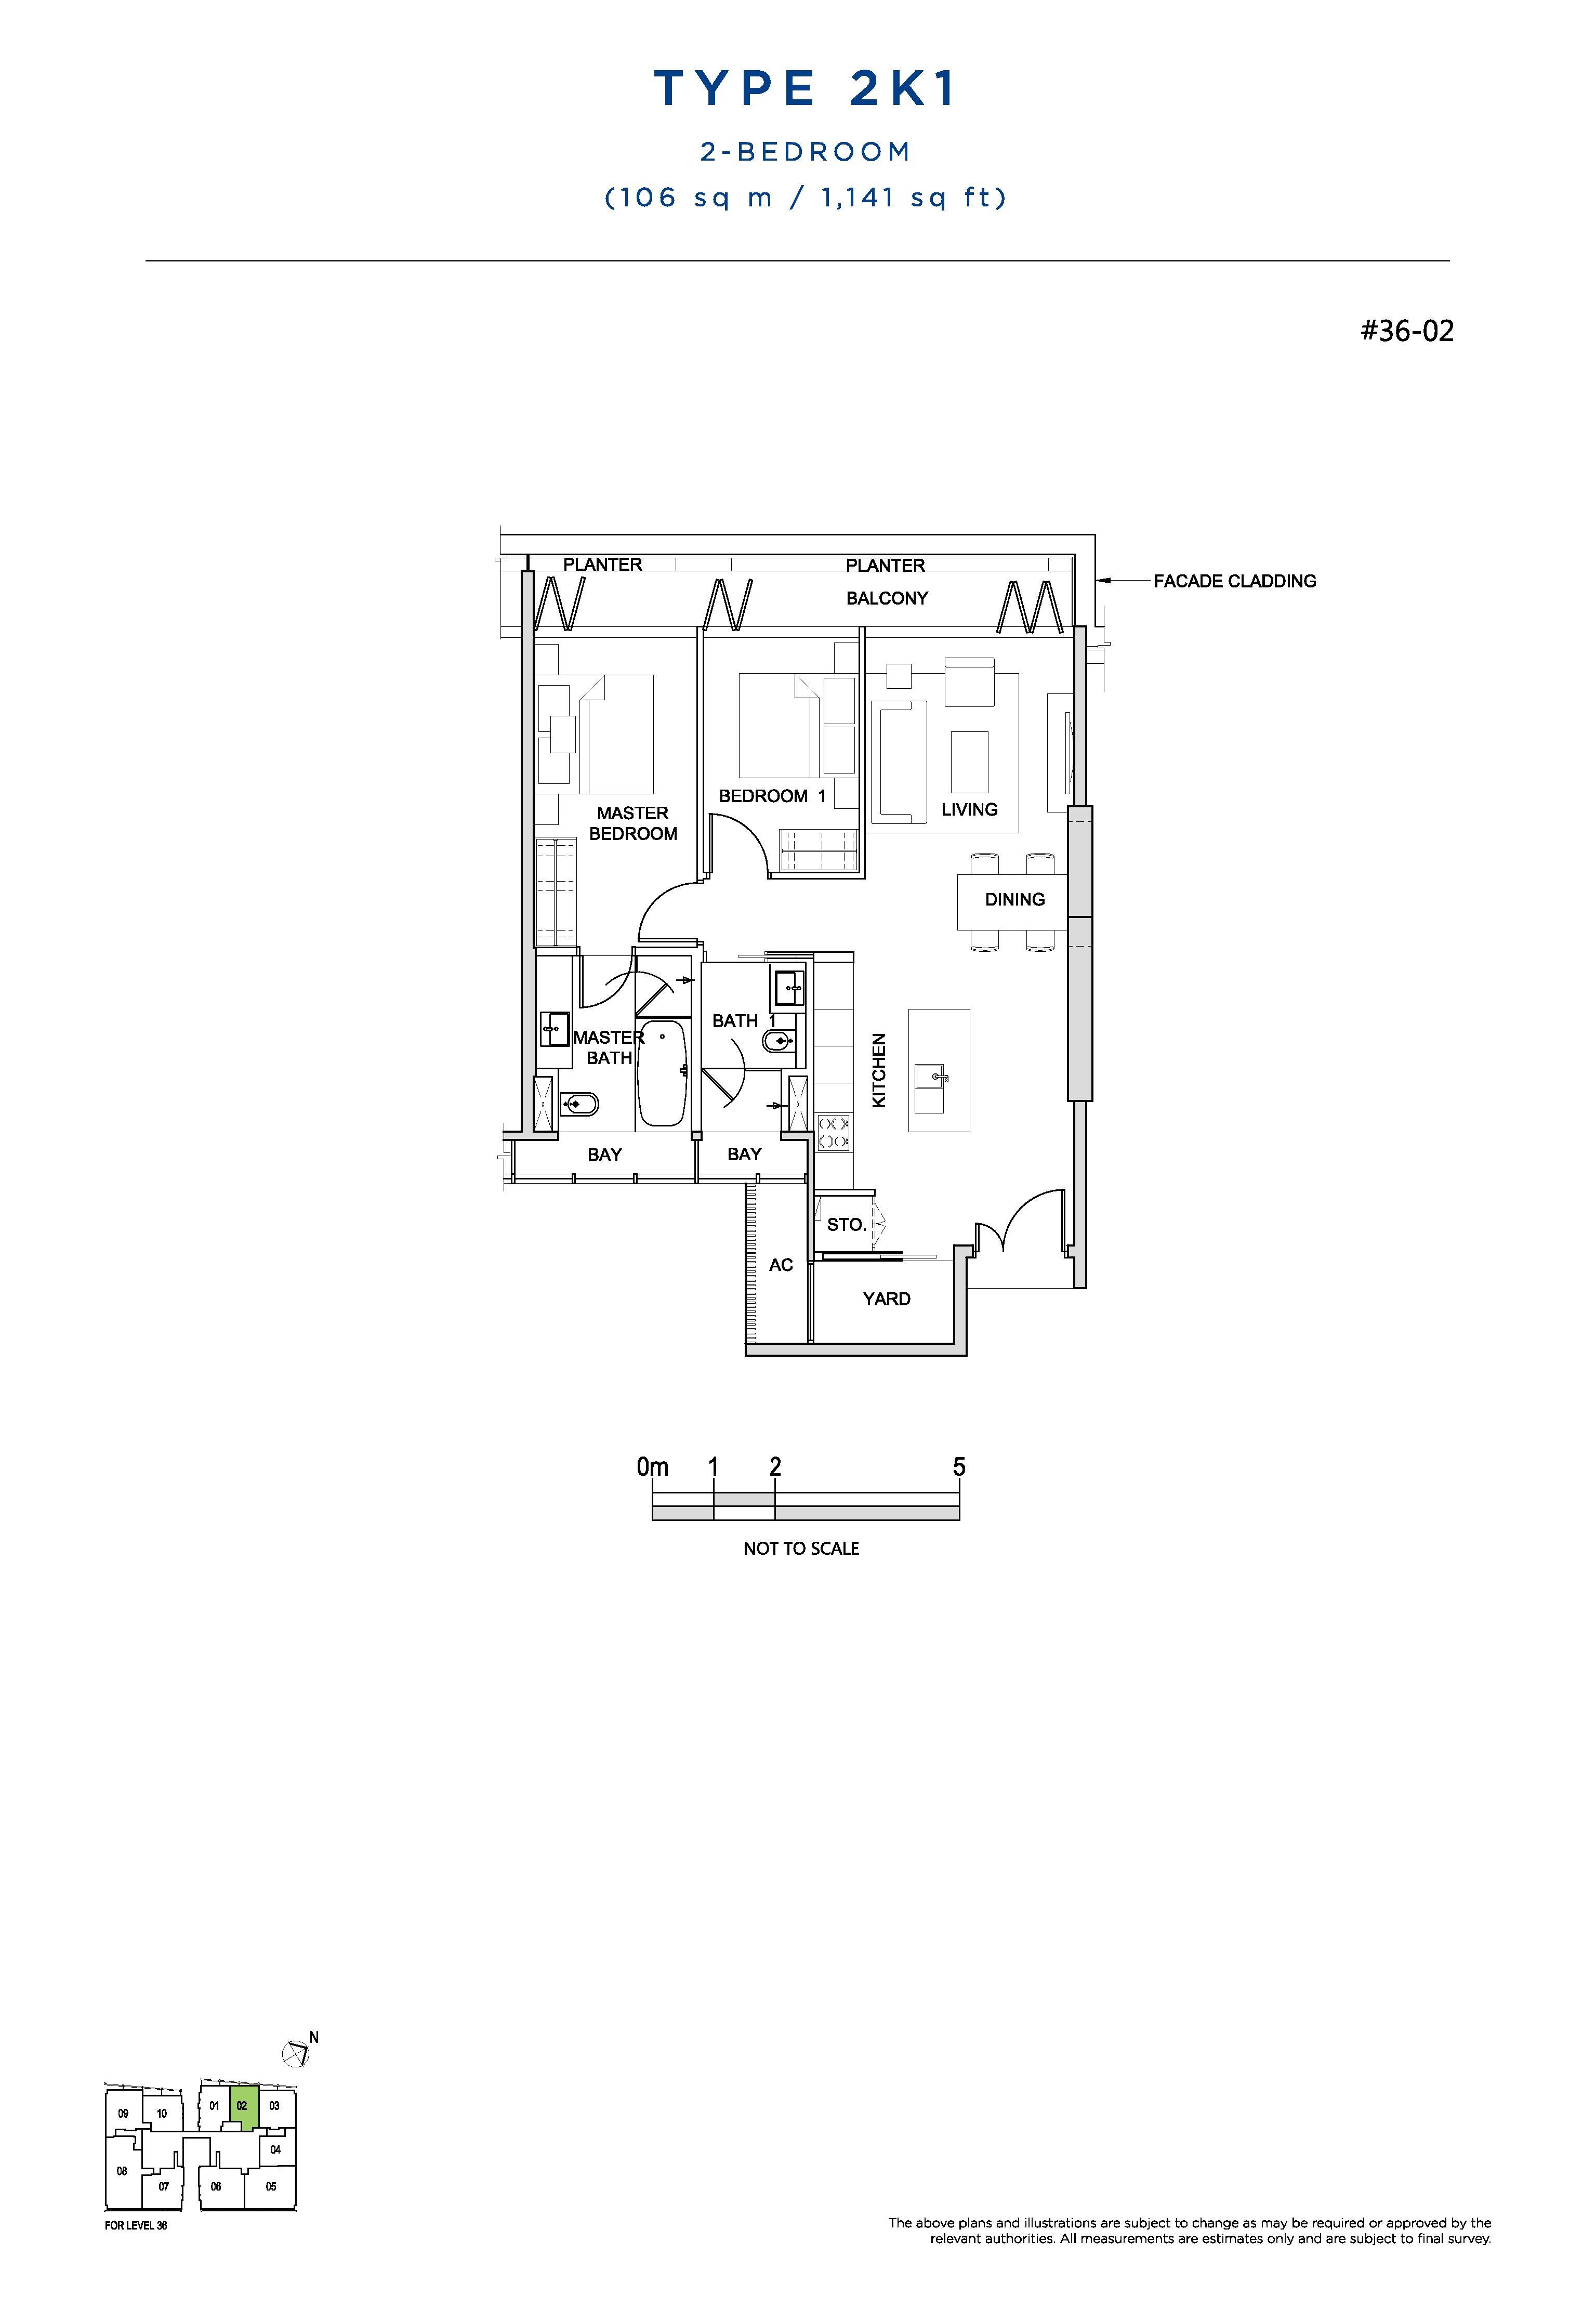 South Beach Residences 2 Bedroom Floor Plans Type 2K1